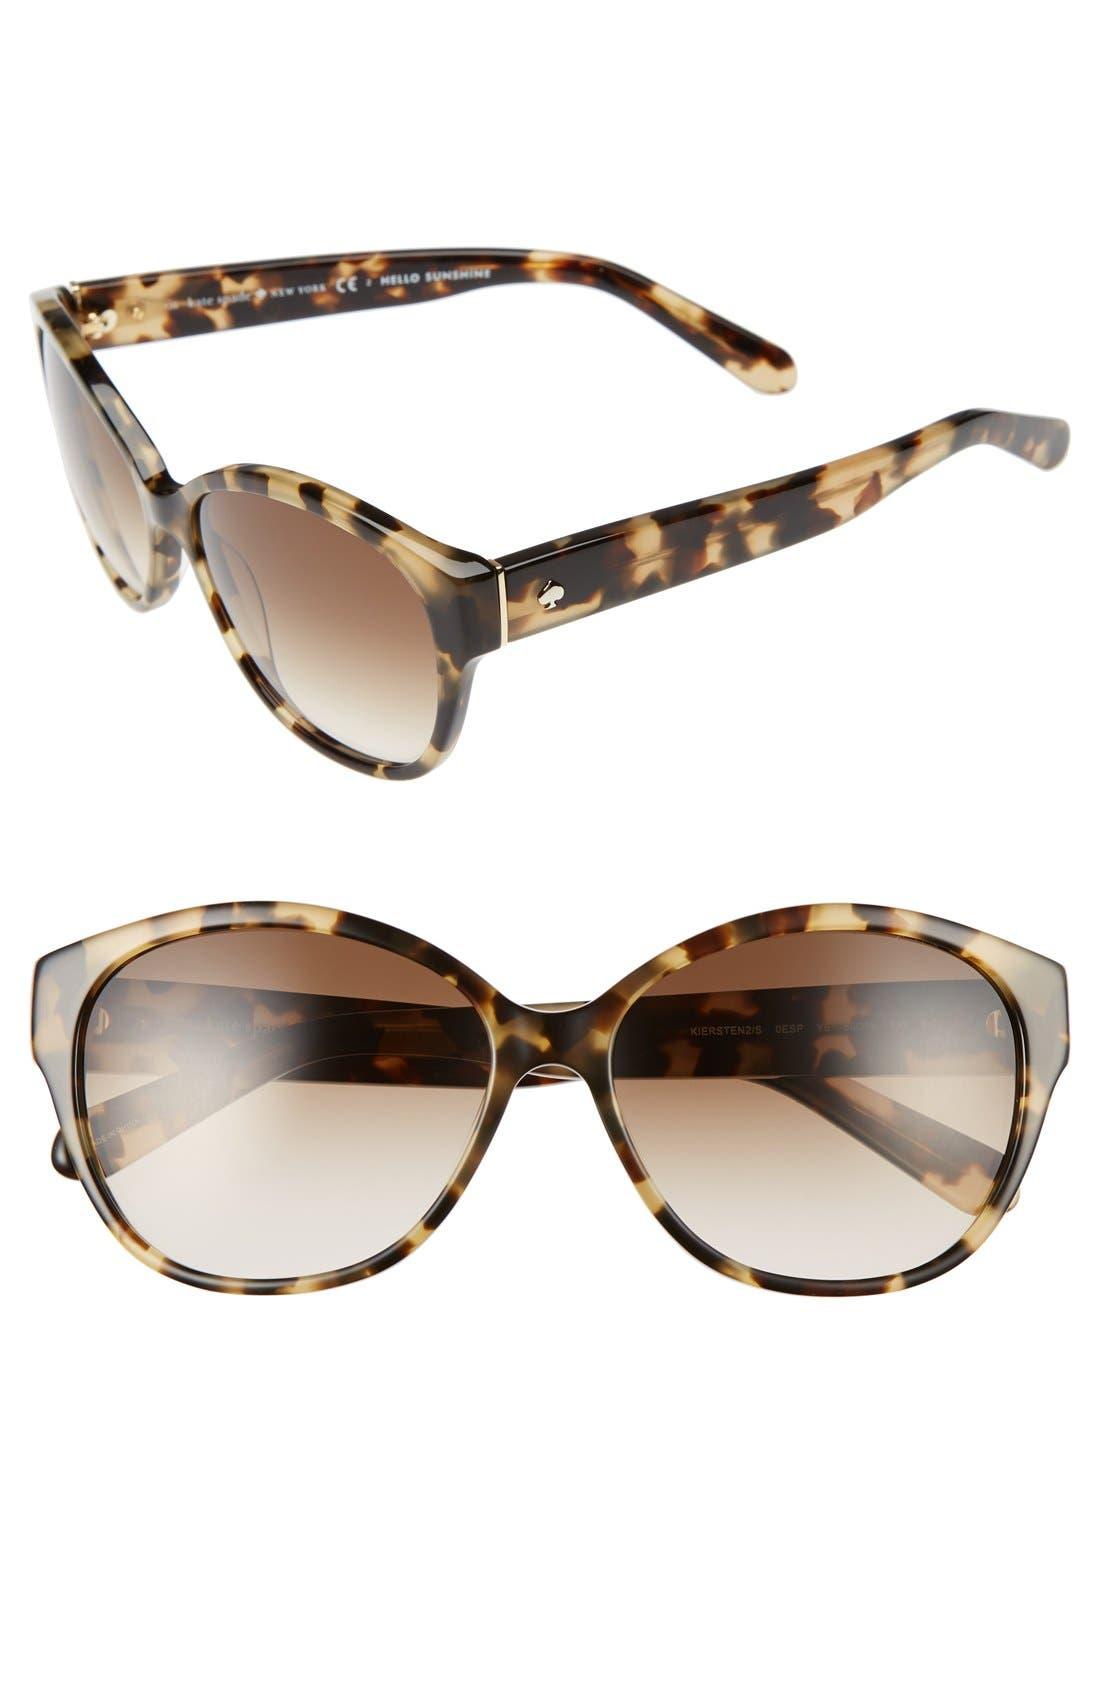 KATE SPADE NEW YORK kiersten 56mm cat eye sunglasses